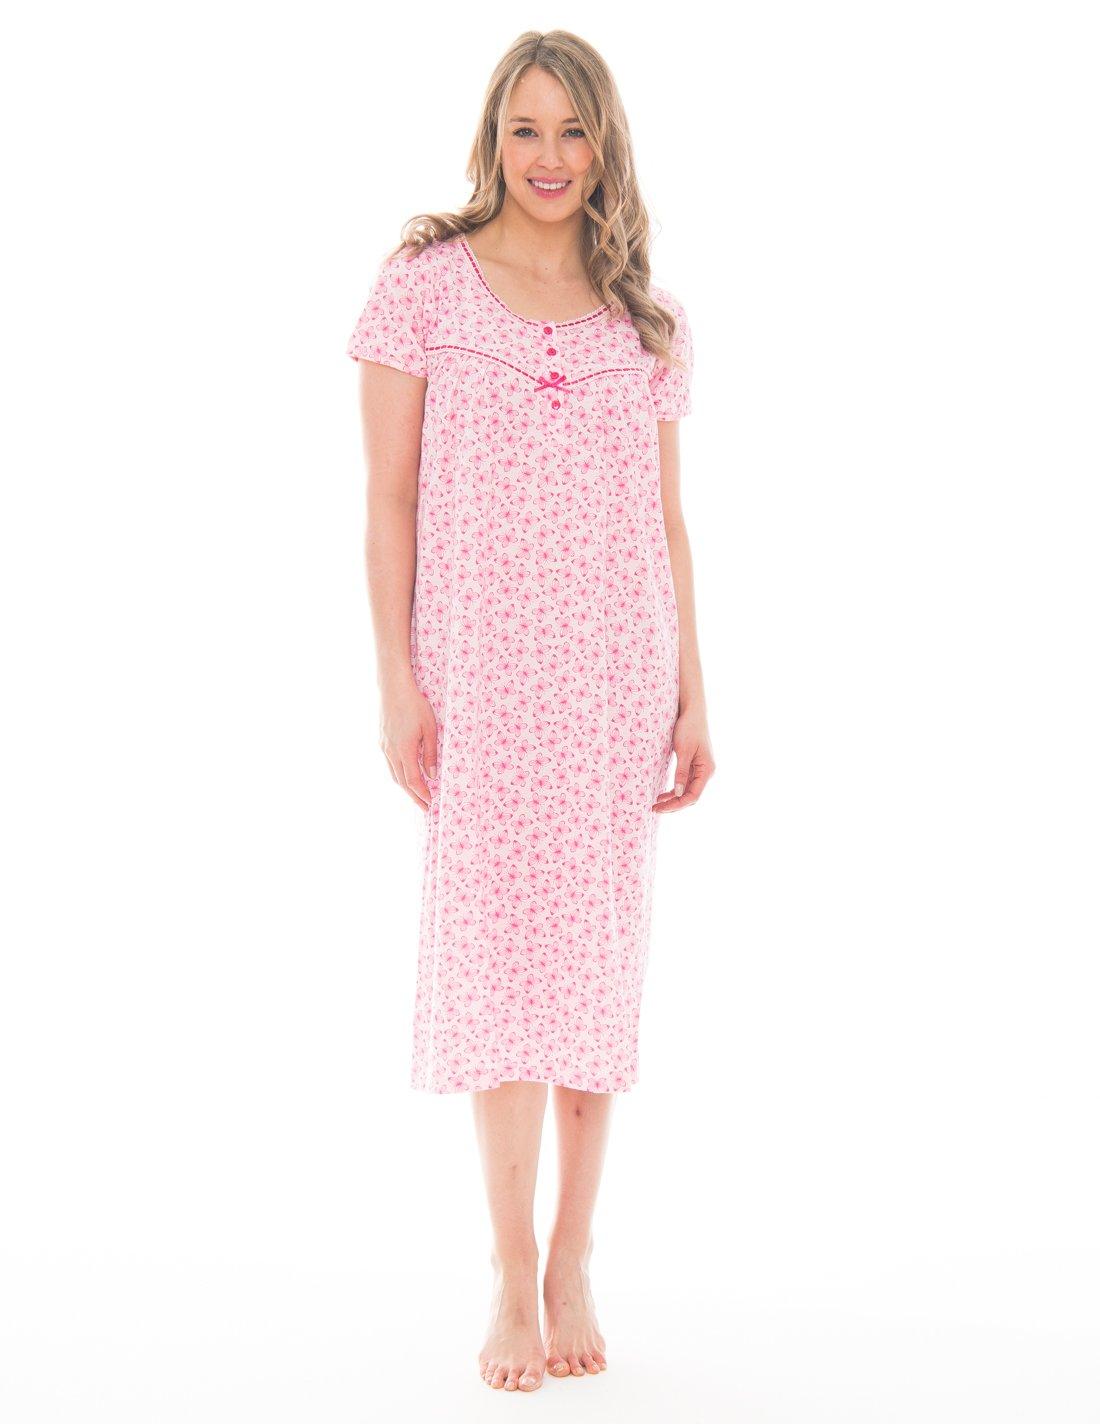 Pink Lady Womens Full Length Sleep Dress Loungewear (Barley Pink Butterfly, X-Large)